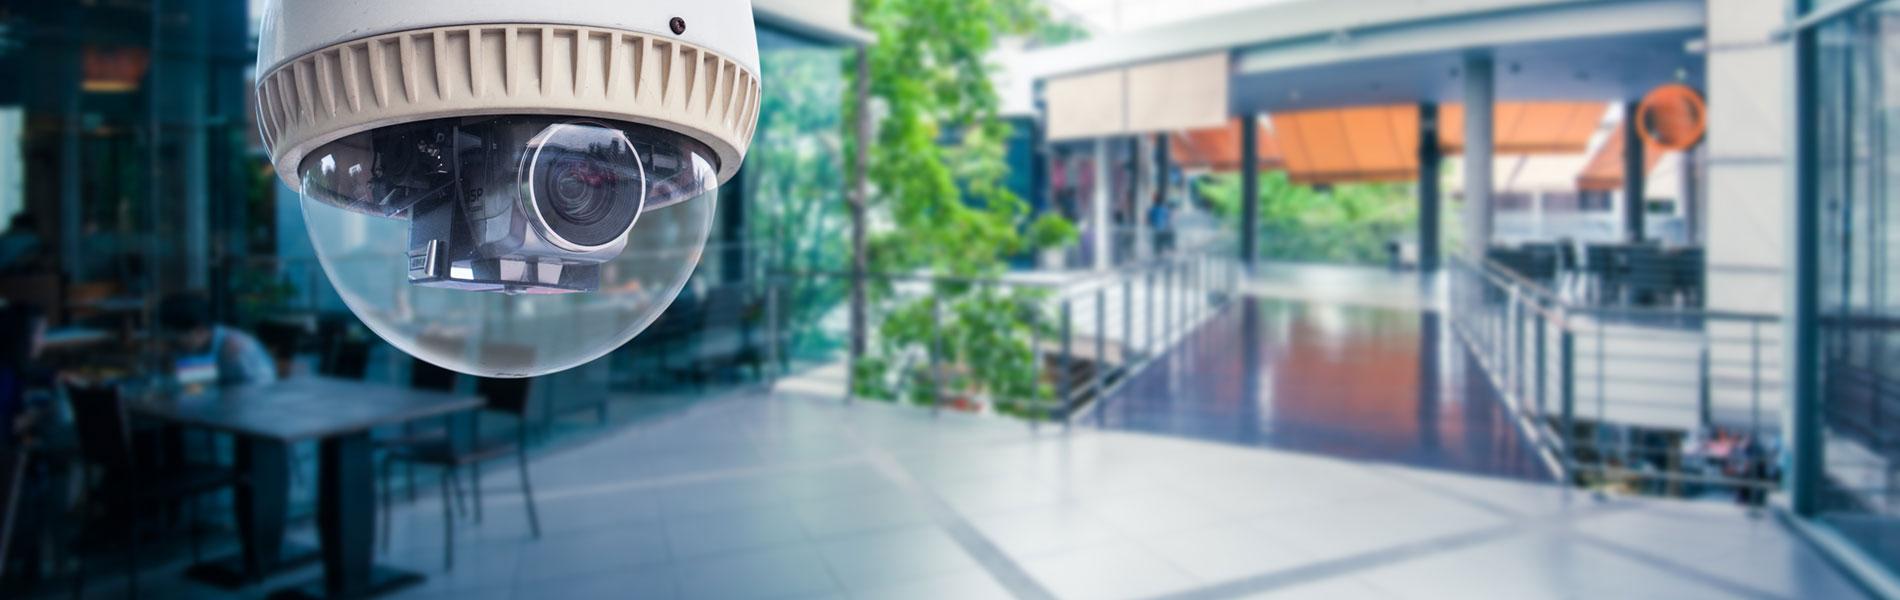 Commercial Burglar Alarms